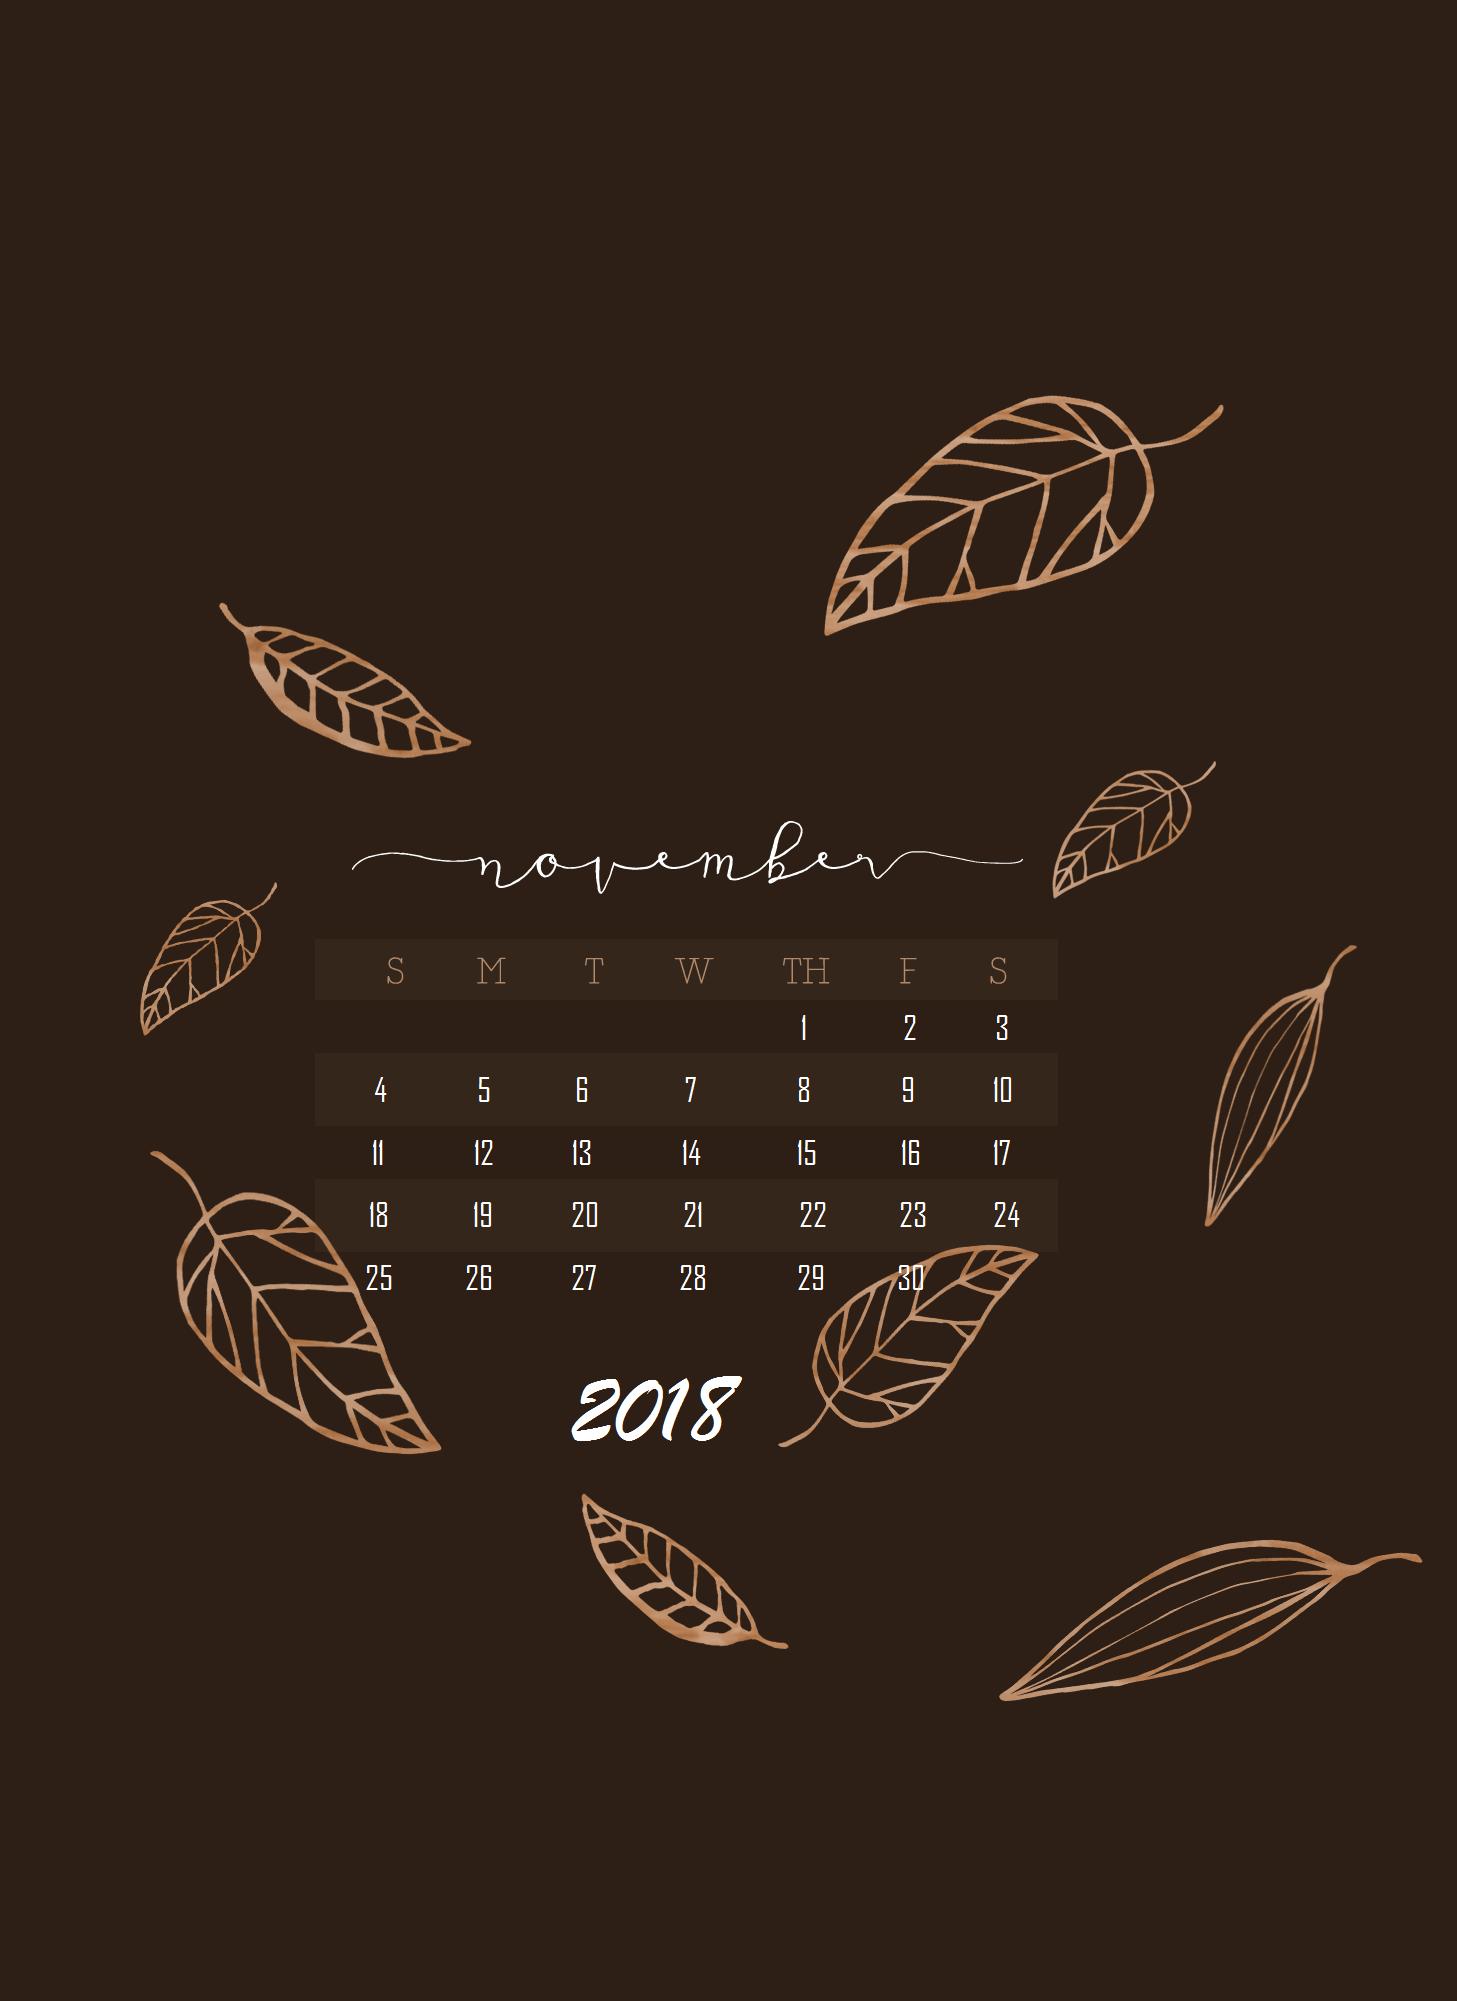 November 2018 Iphone Calendar Wallpaper Calendar Wallpaper November Wallpaper Iphone Wallpaper Winter